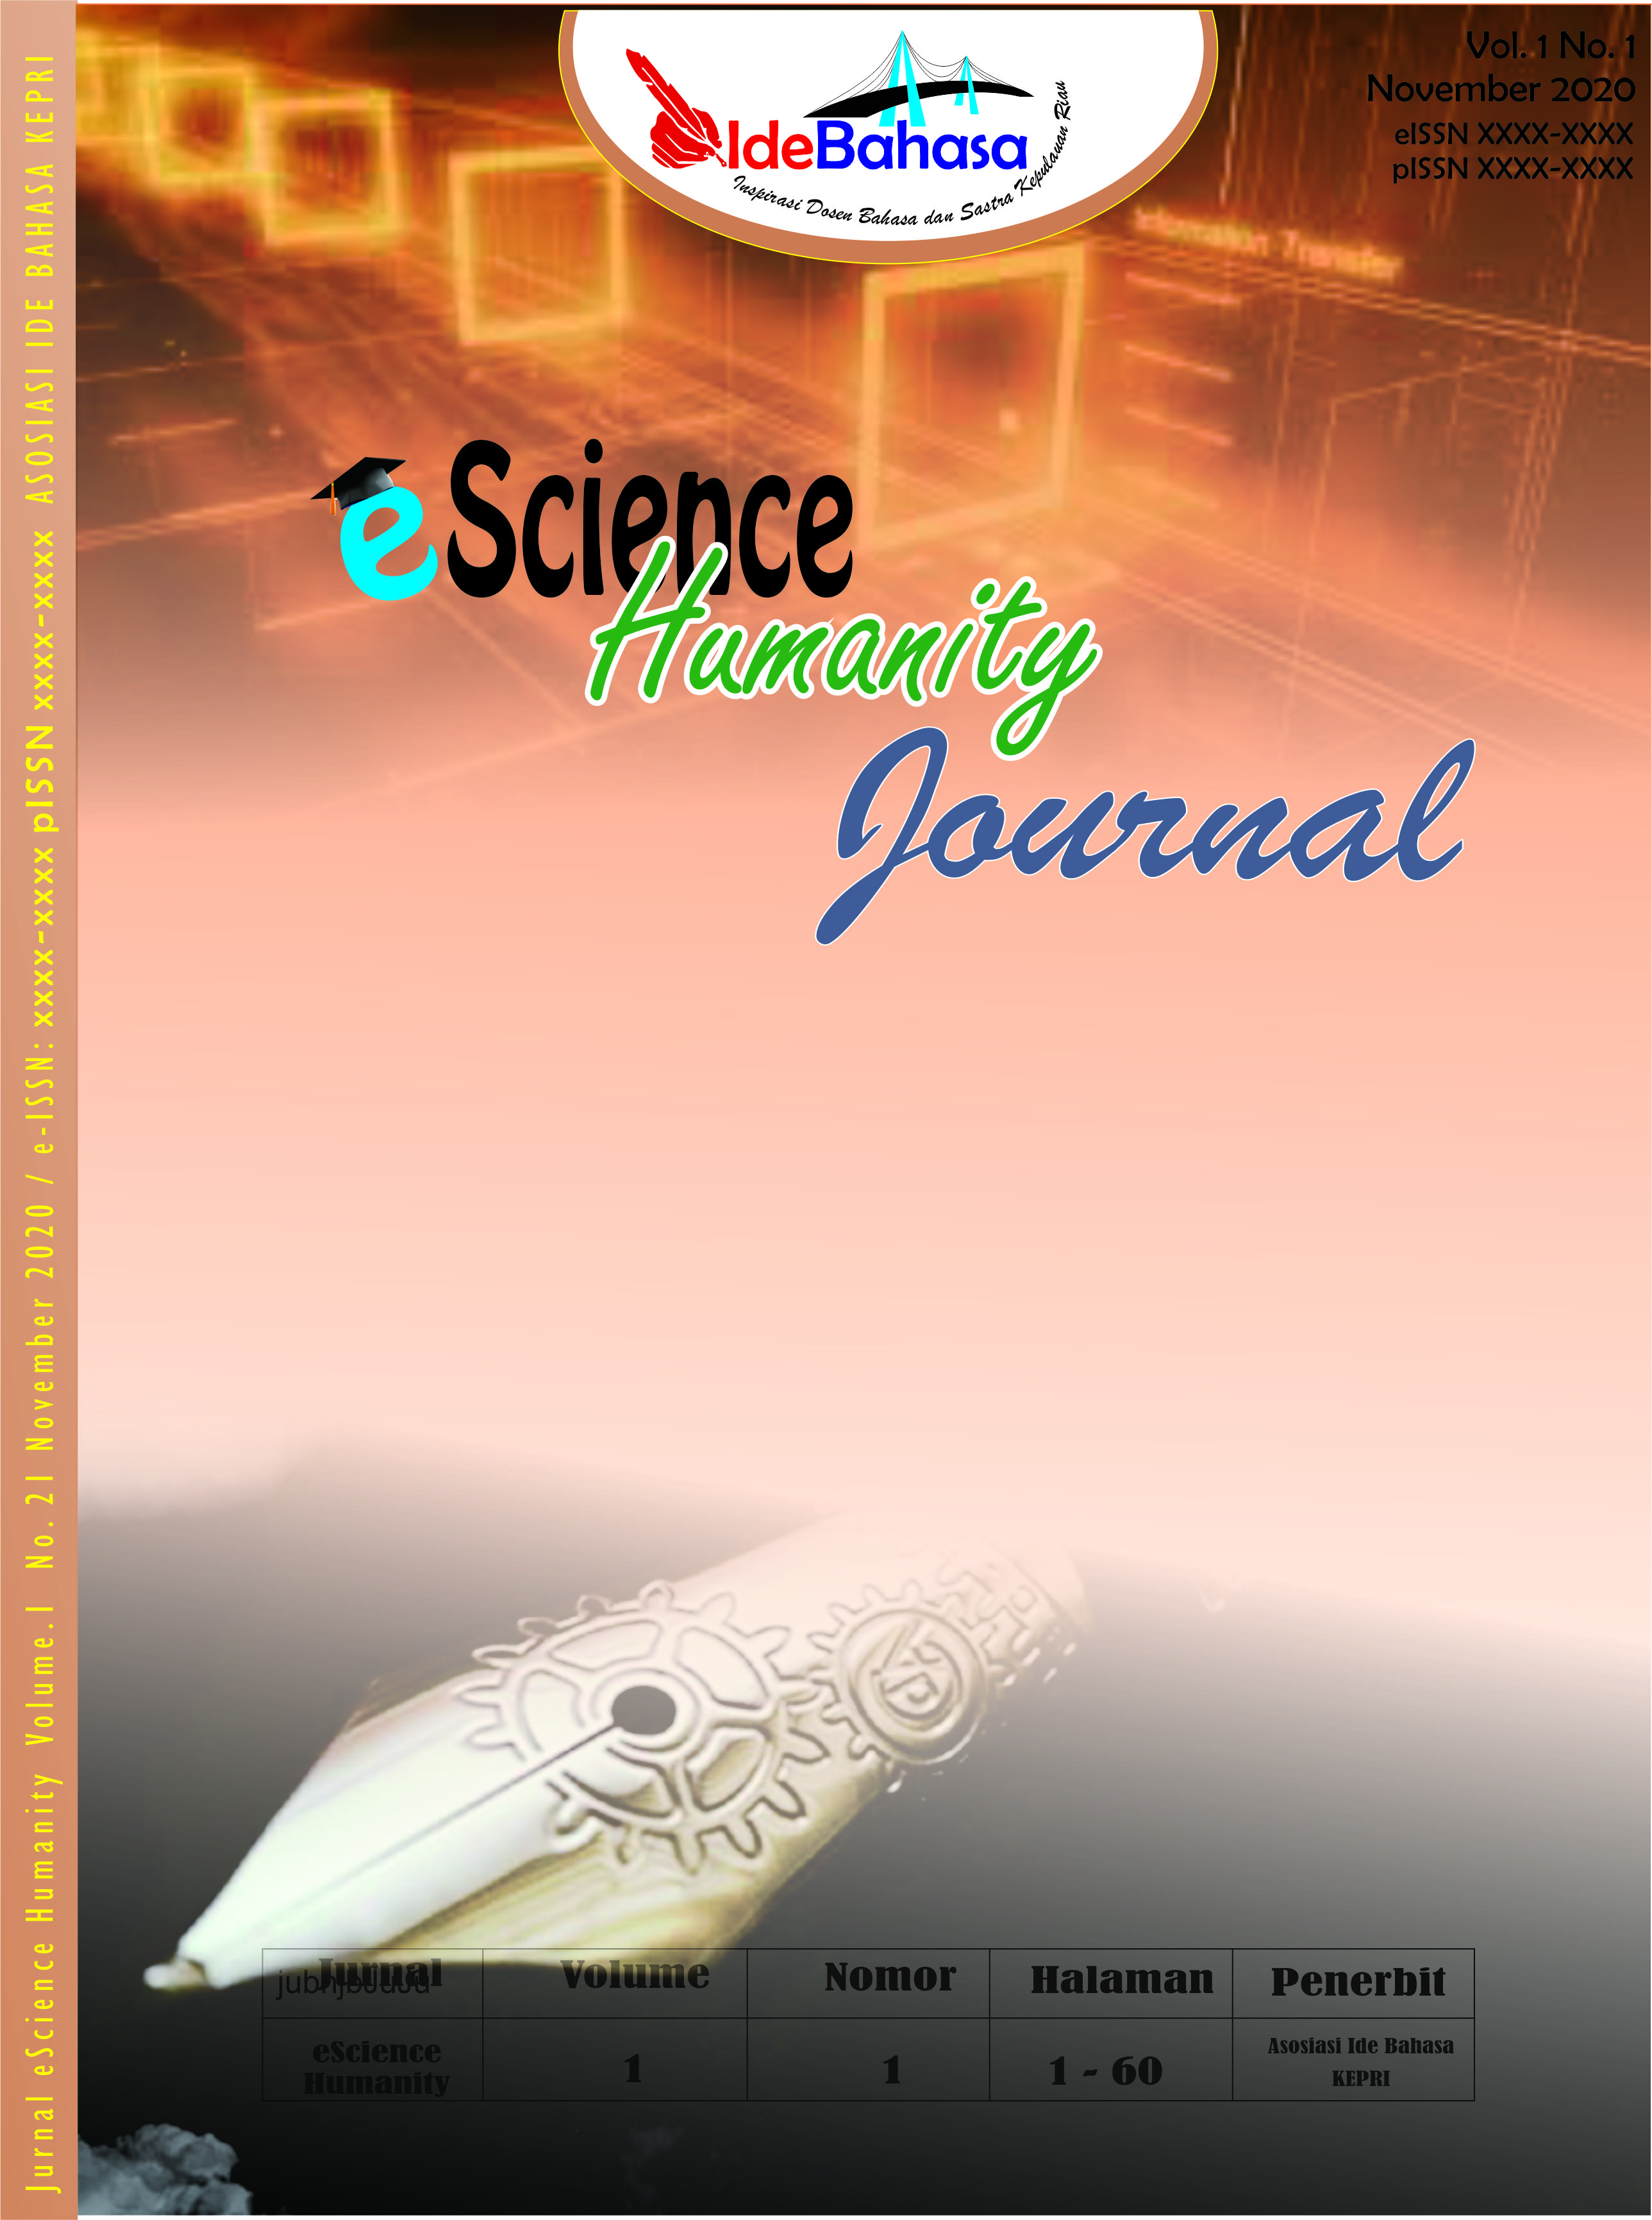 View Vol. 1 No. 1 (2020): eScience Humanity Journal Volume 1 Number 1 November 2020